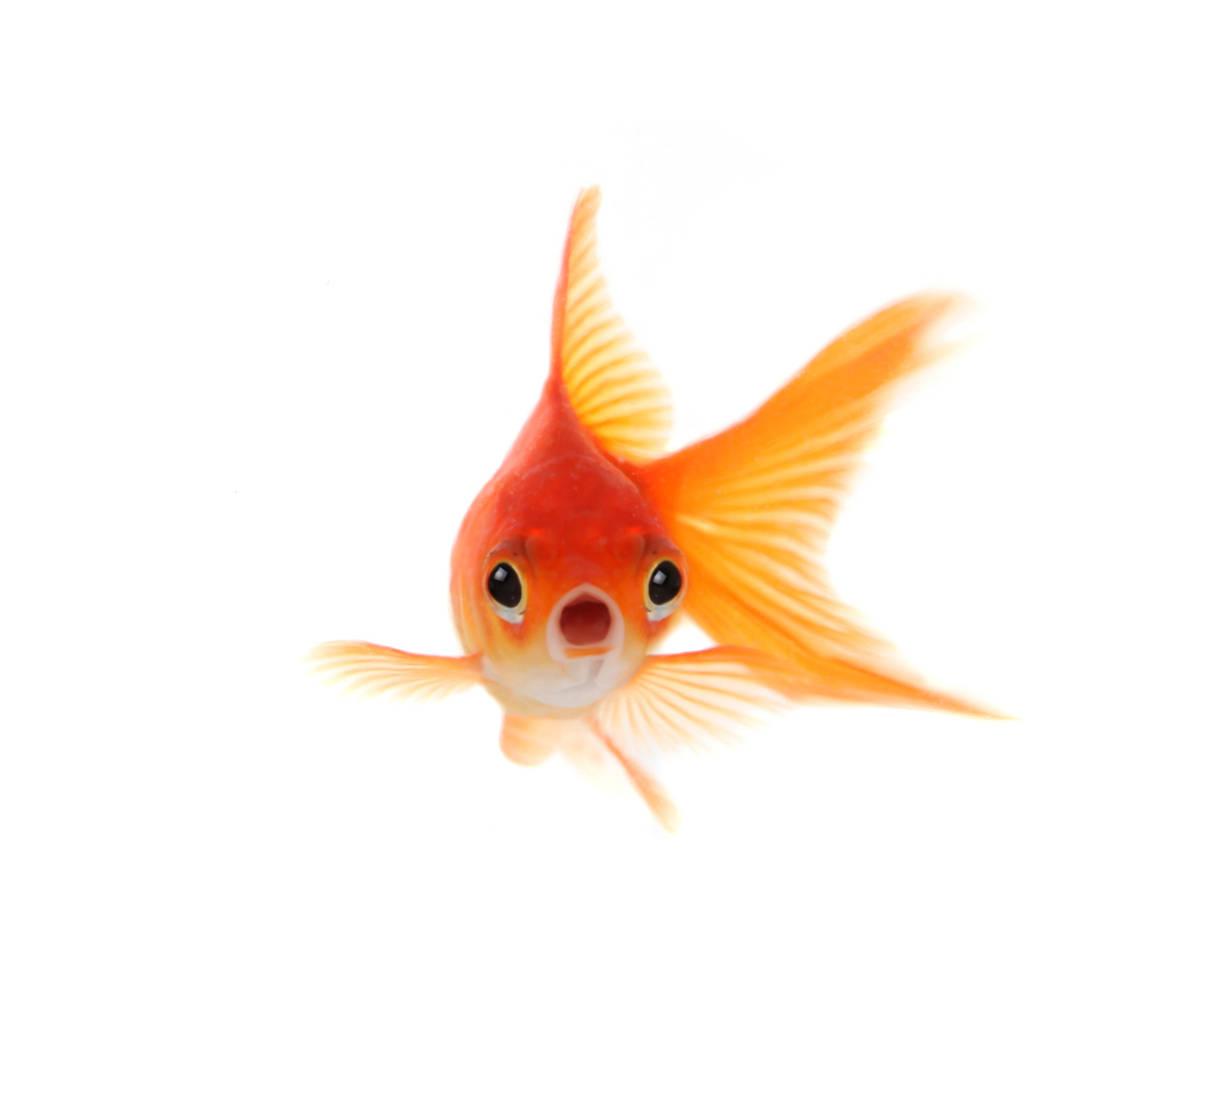 goldfish-animal-myths.jpg